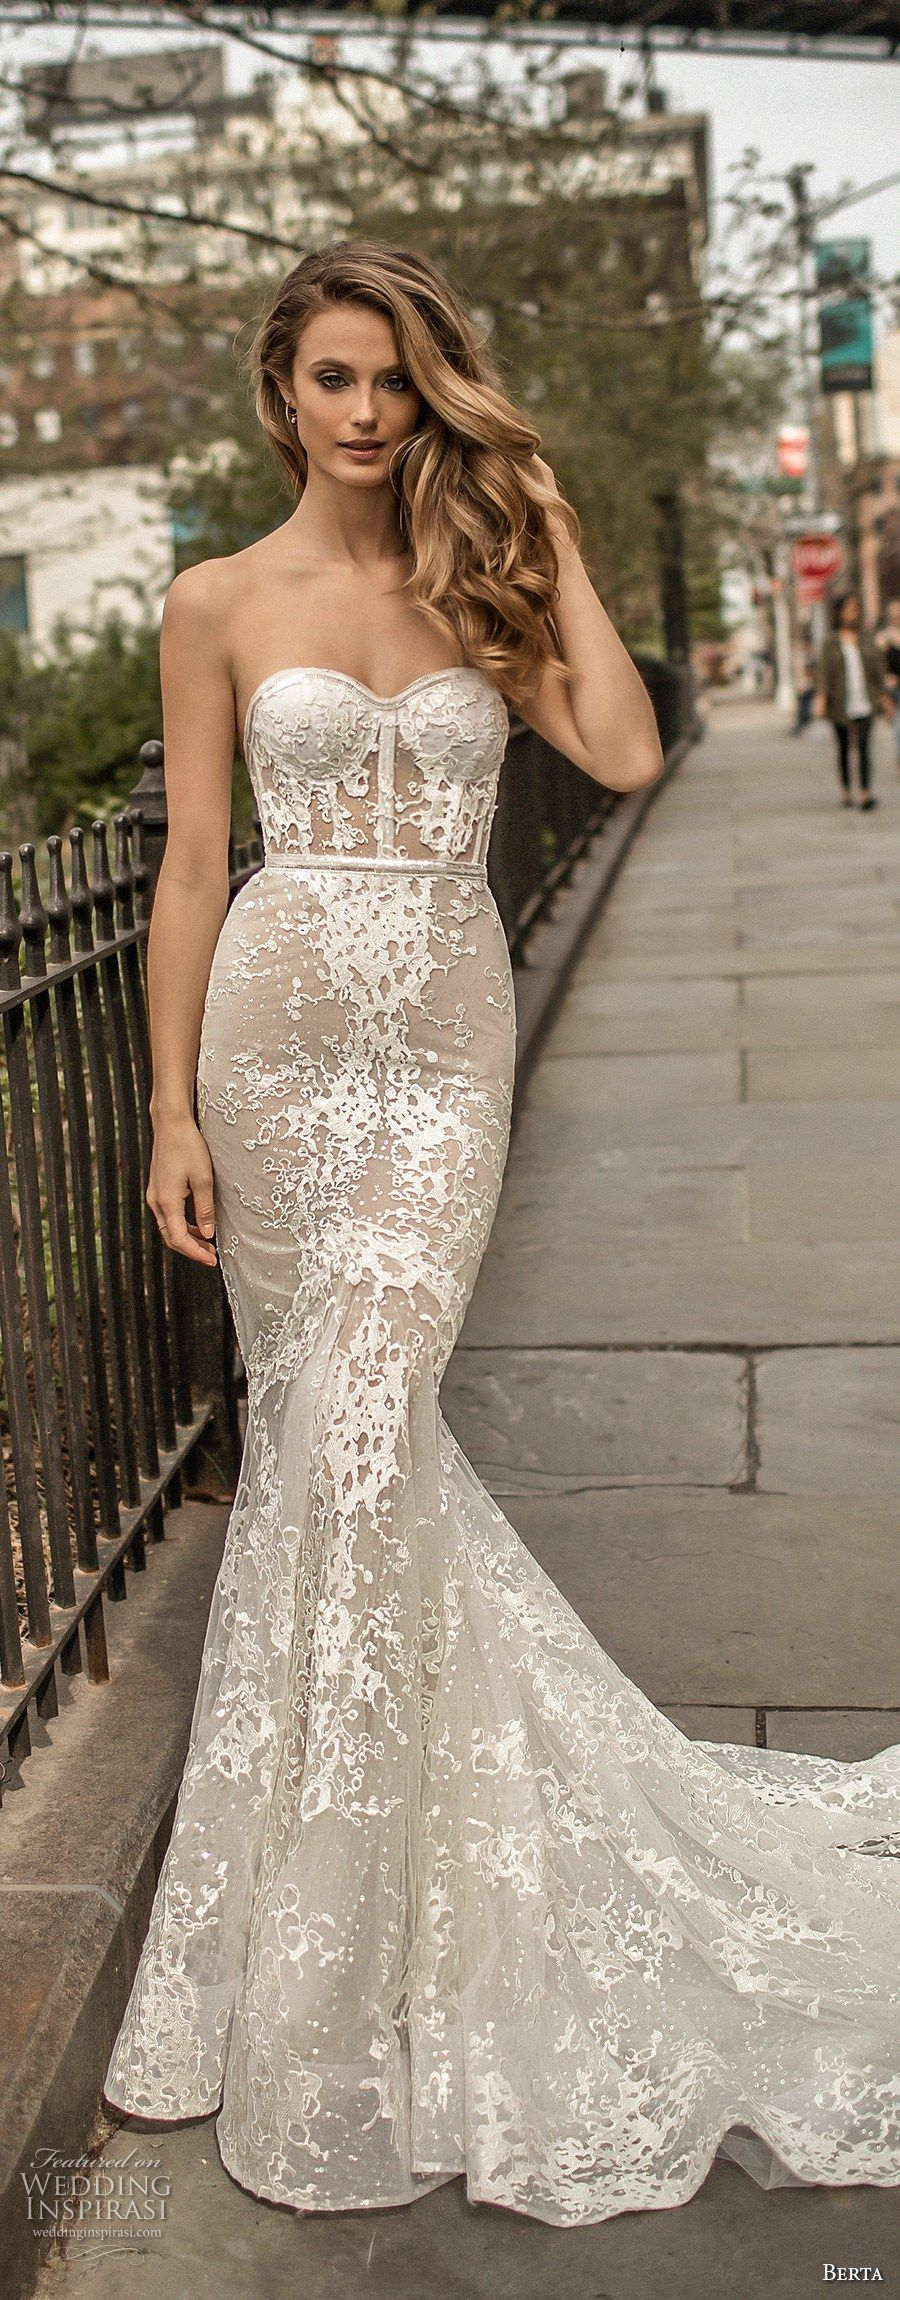 Berta bridal spring wedding dresses u part the wedding